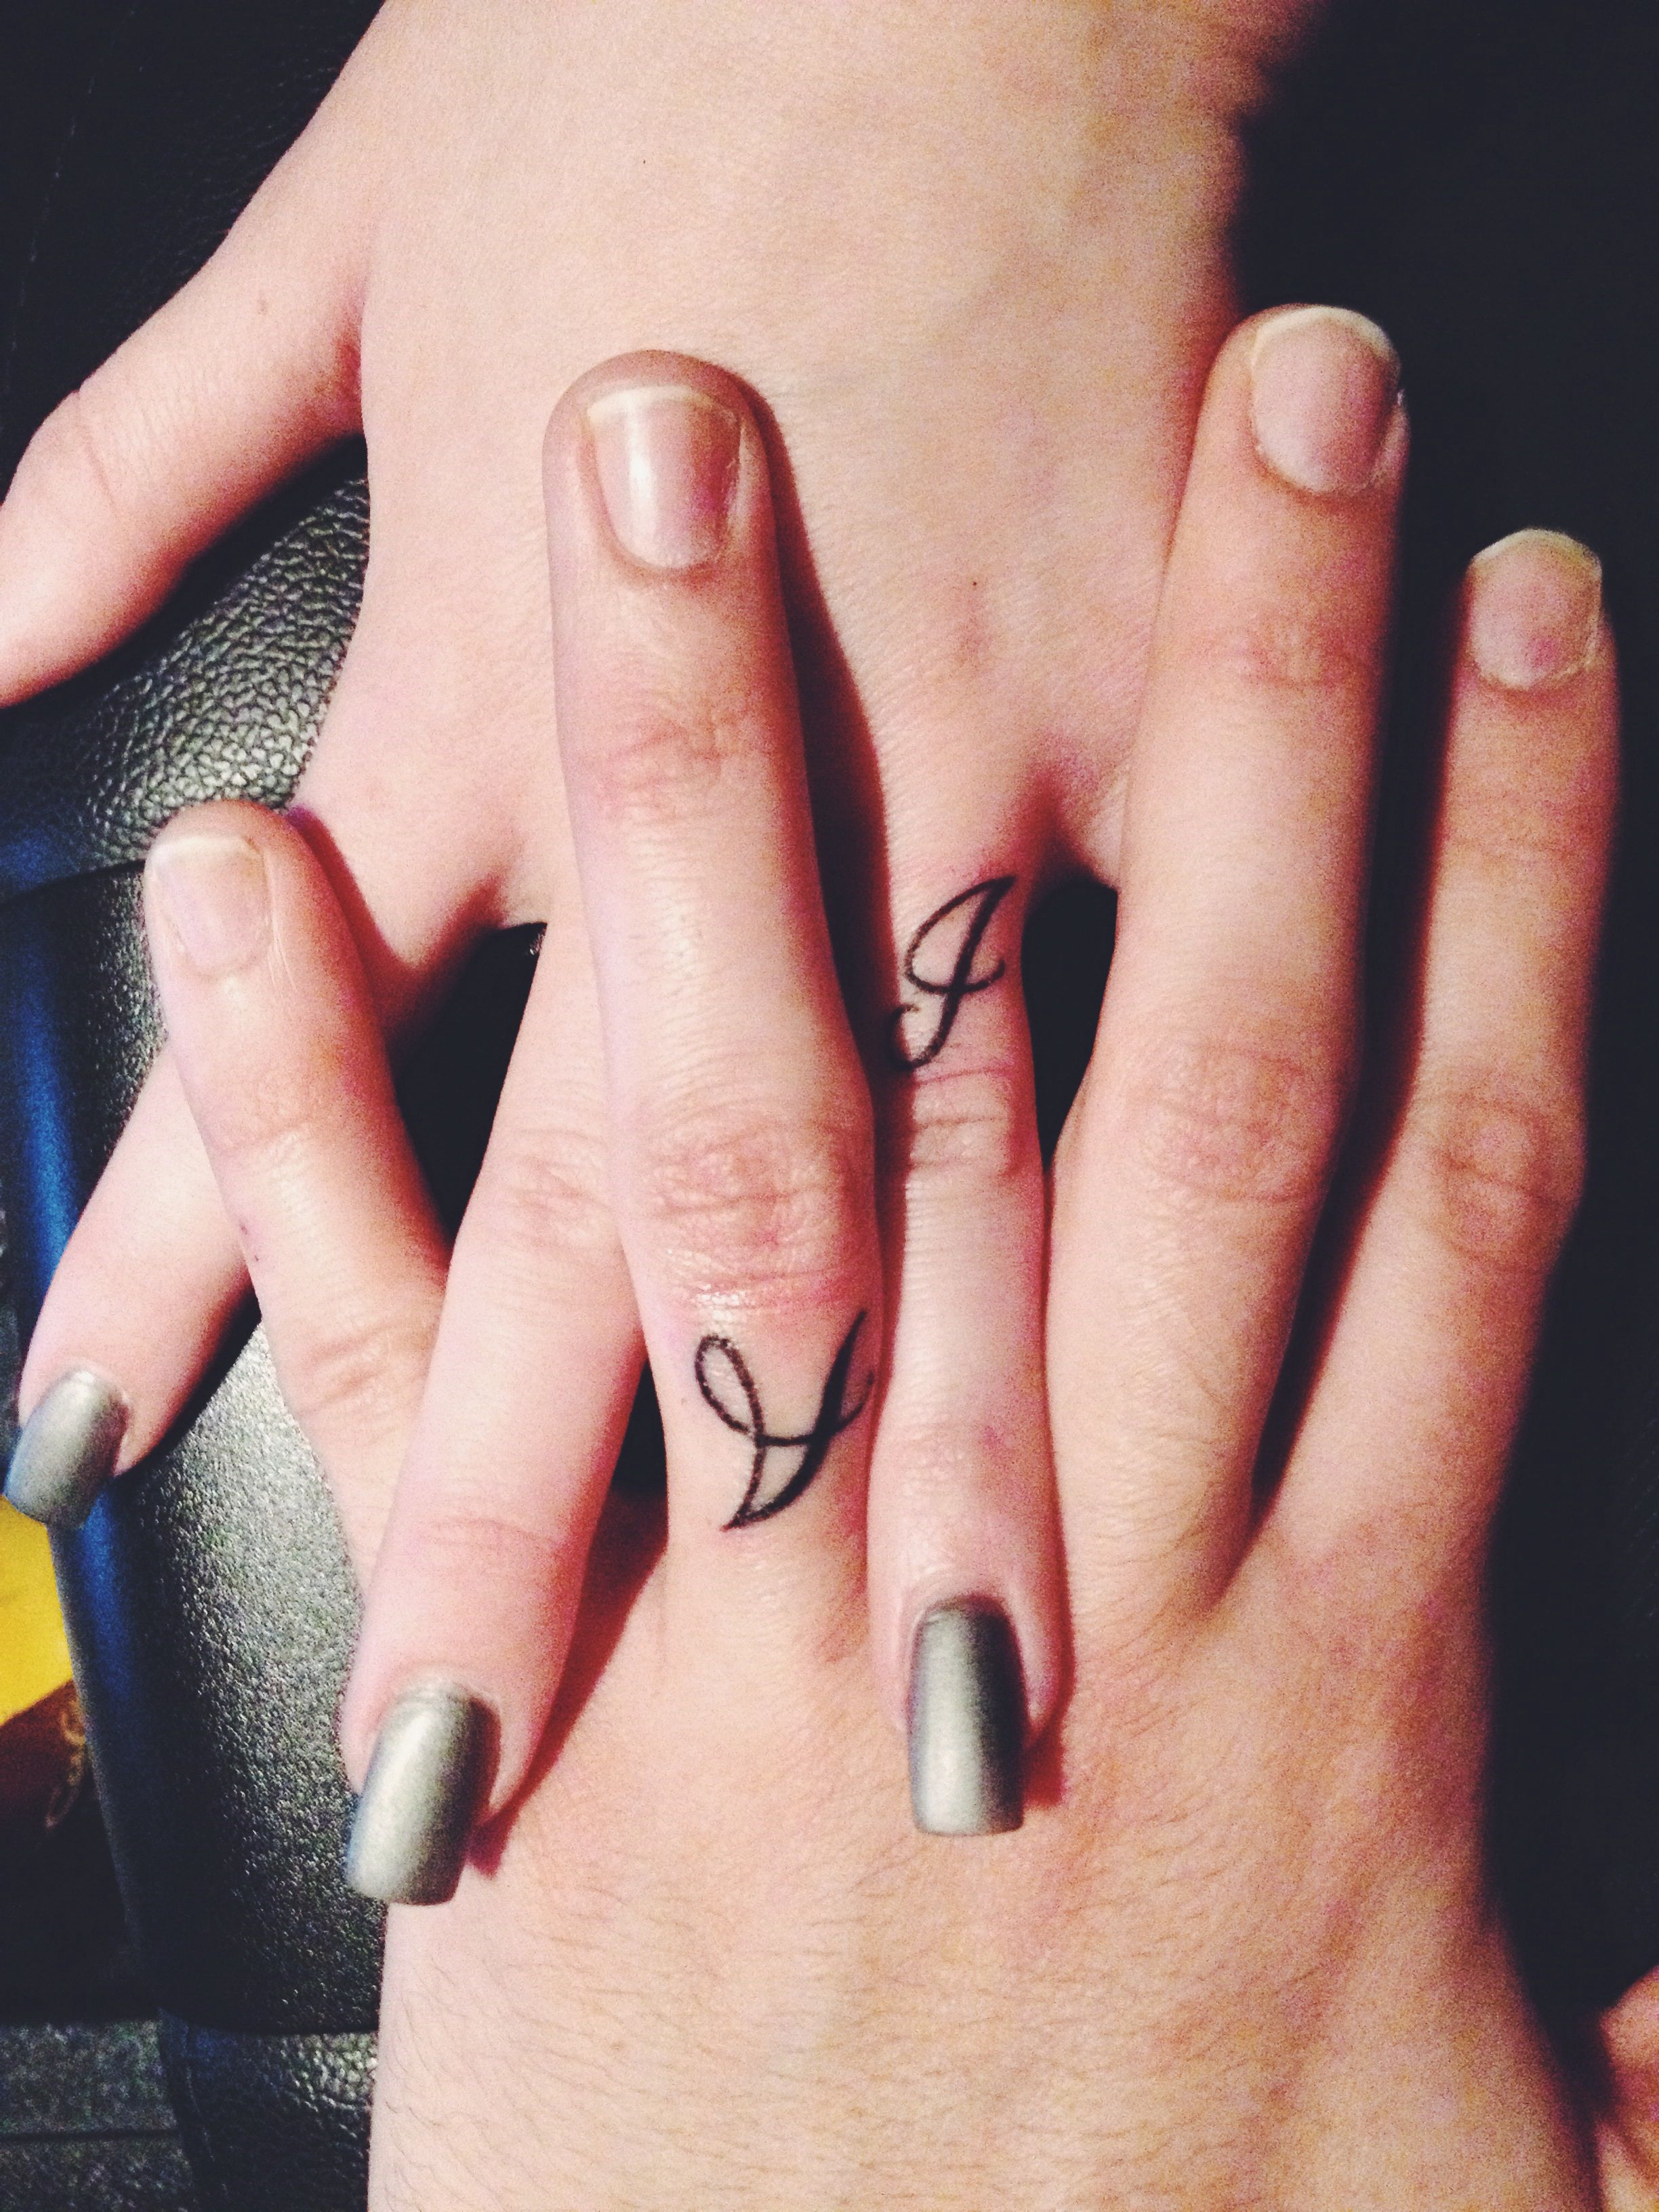 Marriage ring finger tattoos tattoos Pinterest